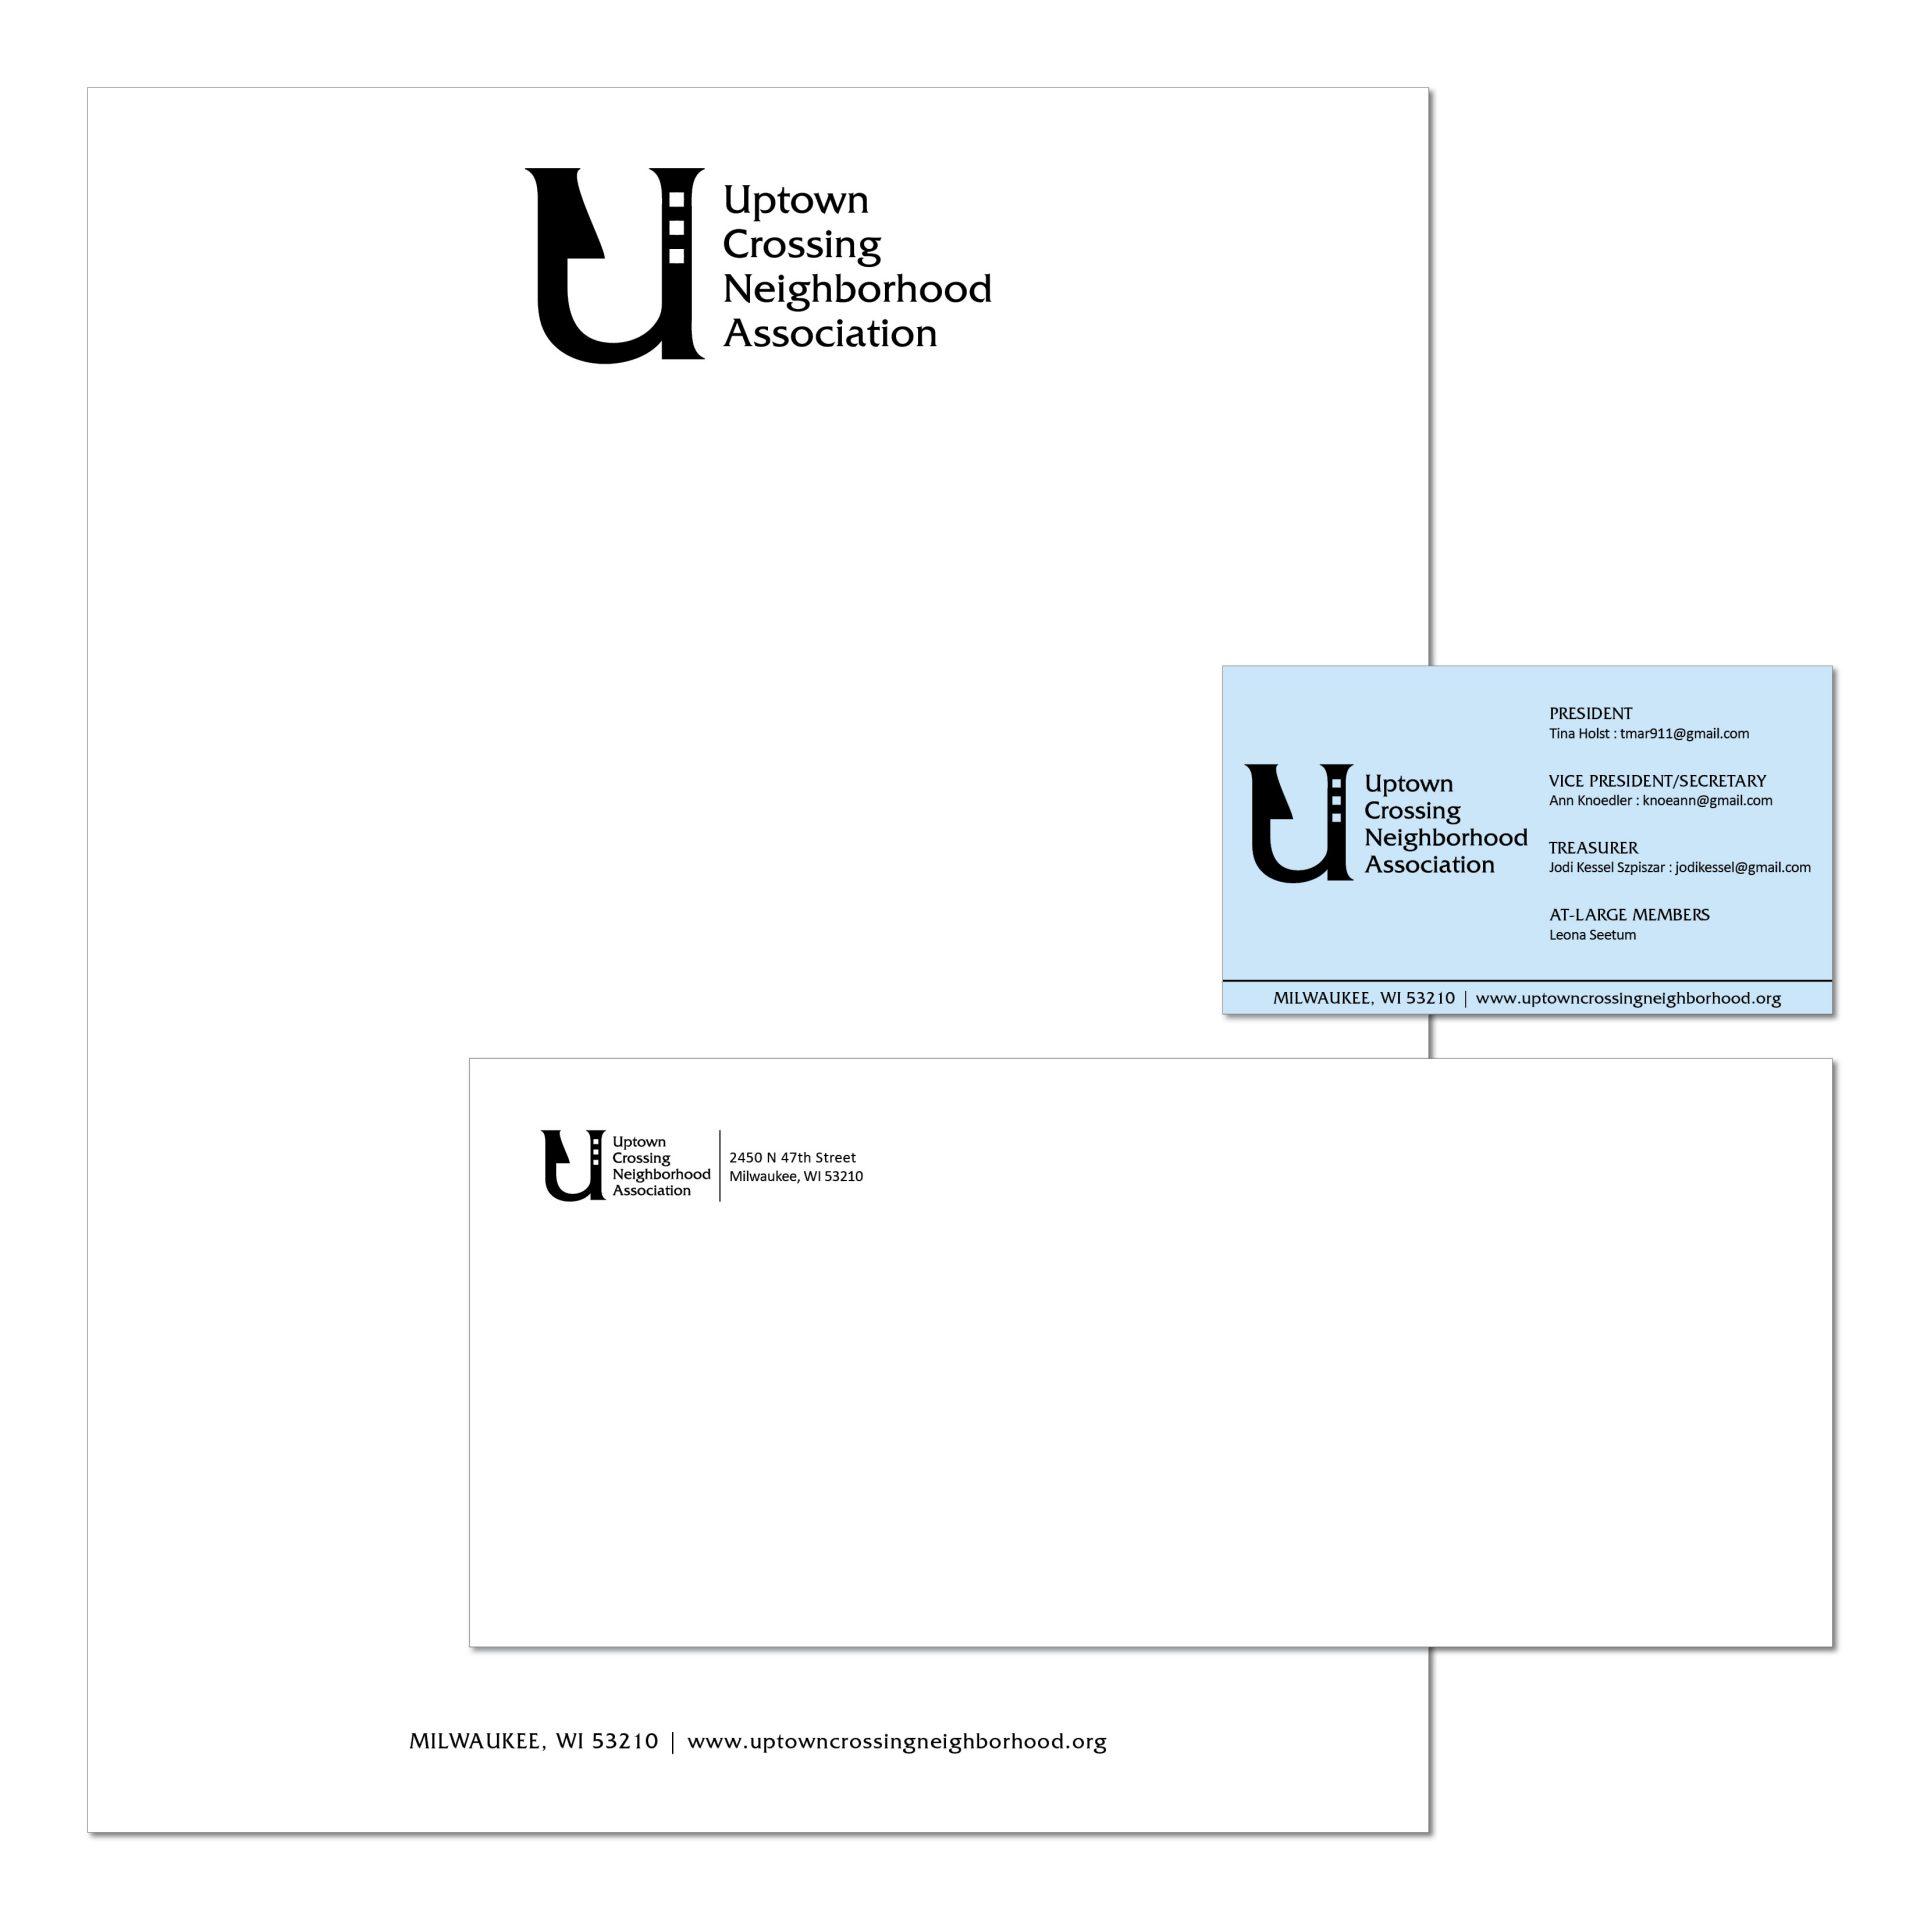 2017 | Uptown Crossing Neighborhood Association | logo, business card, letterhead, envelope